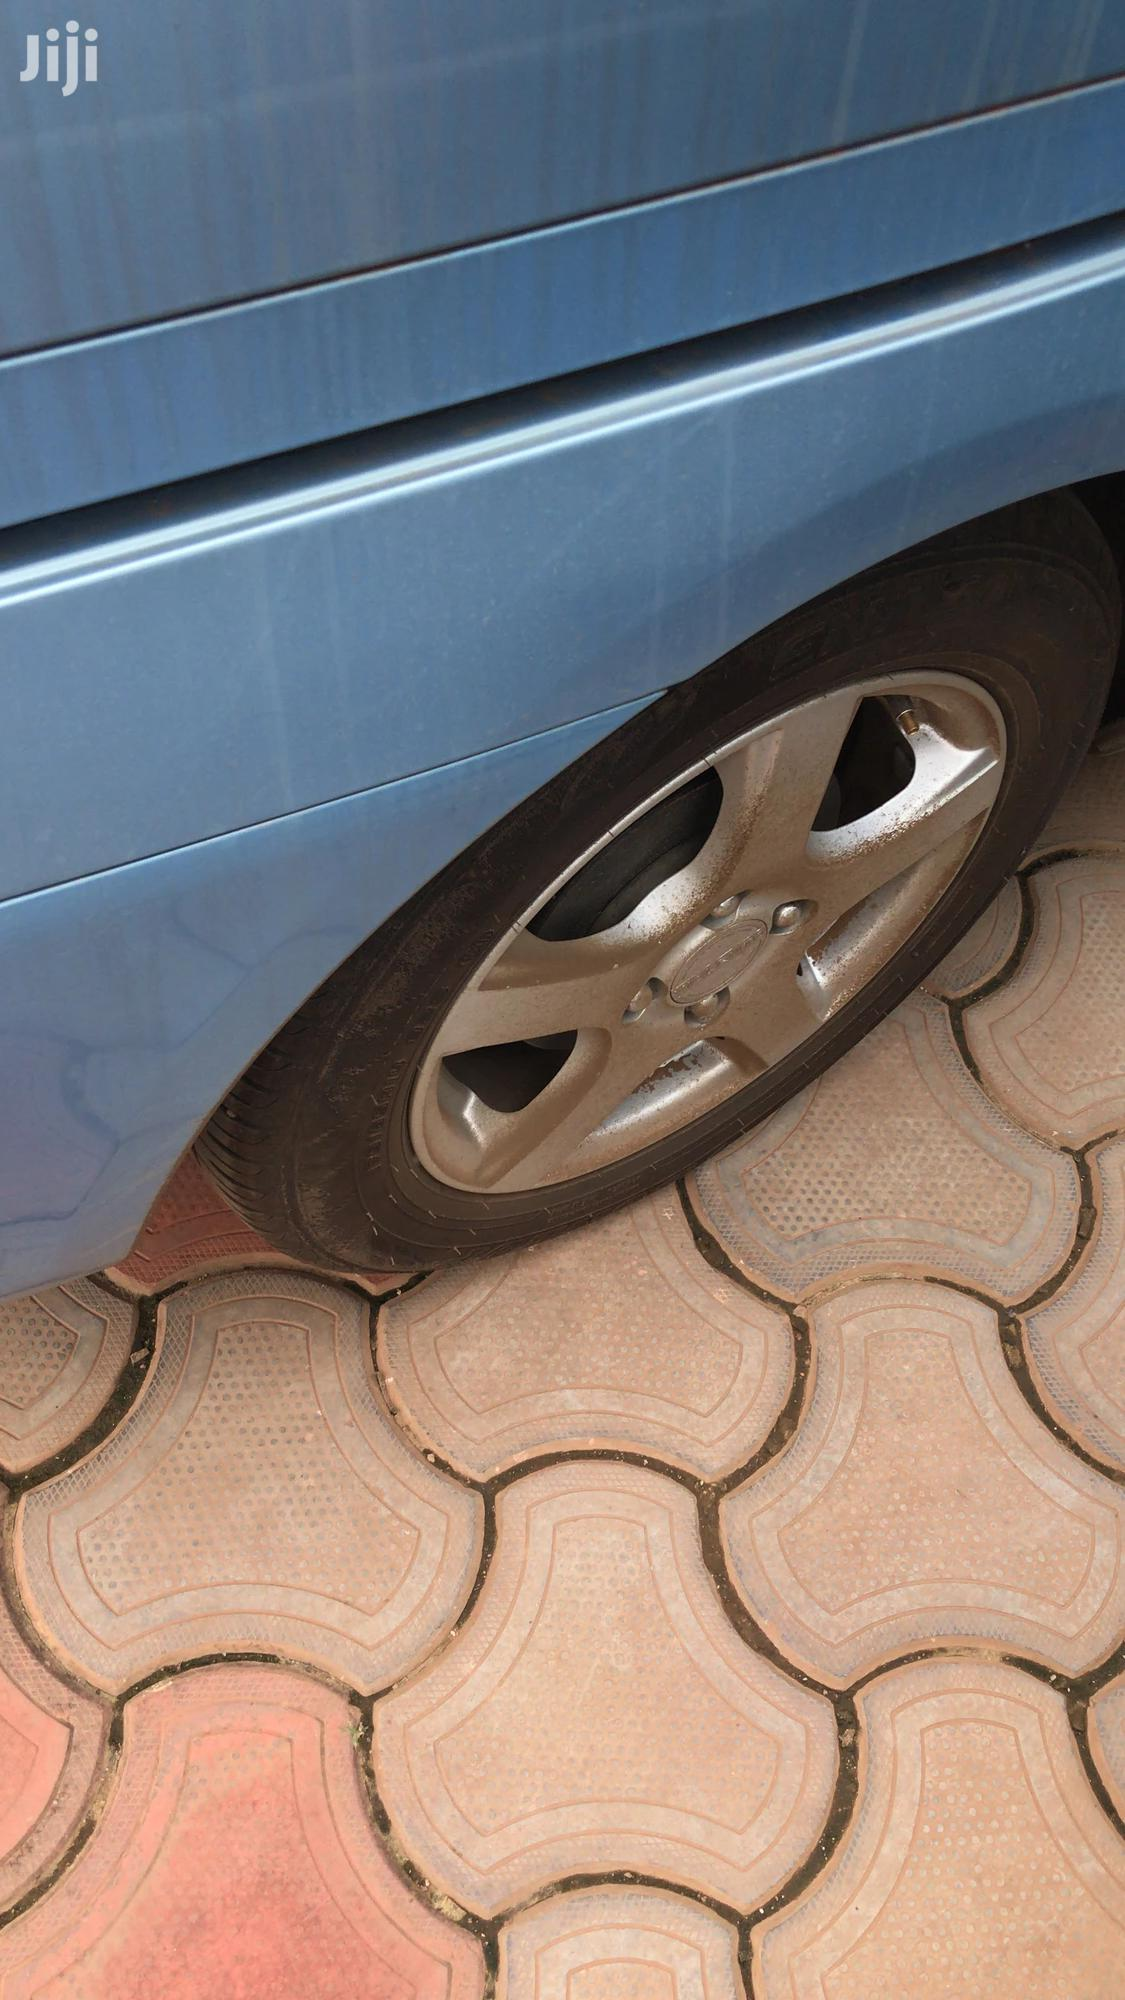 Archive: Toyota Raum 2006 Blue